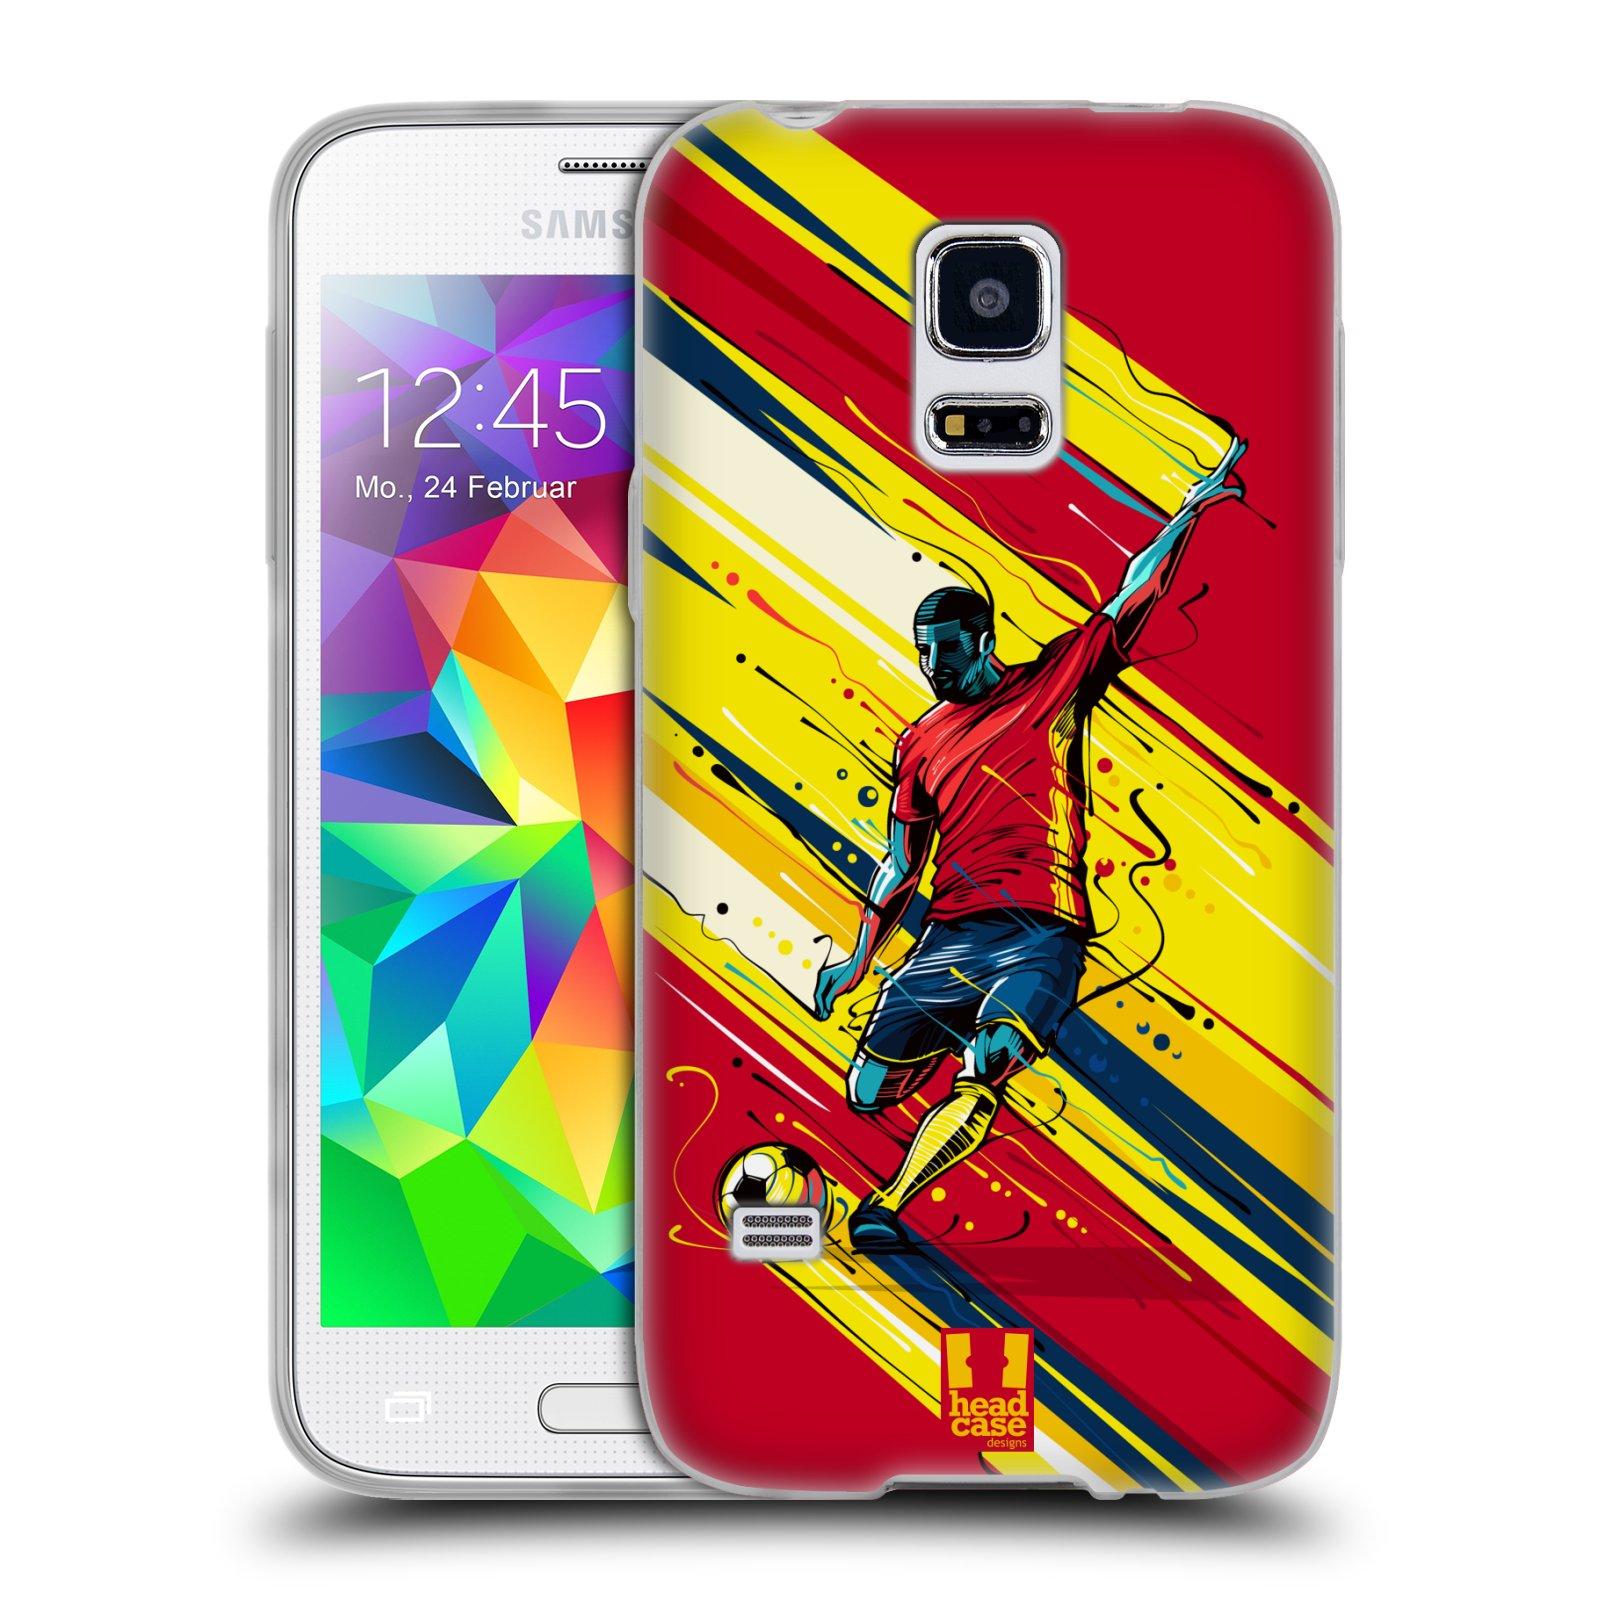 HEAD CASE silikonový obal na mobil Samsung Galaxy S5 MINI Sport fotbal střela do brány